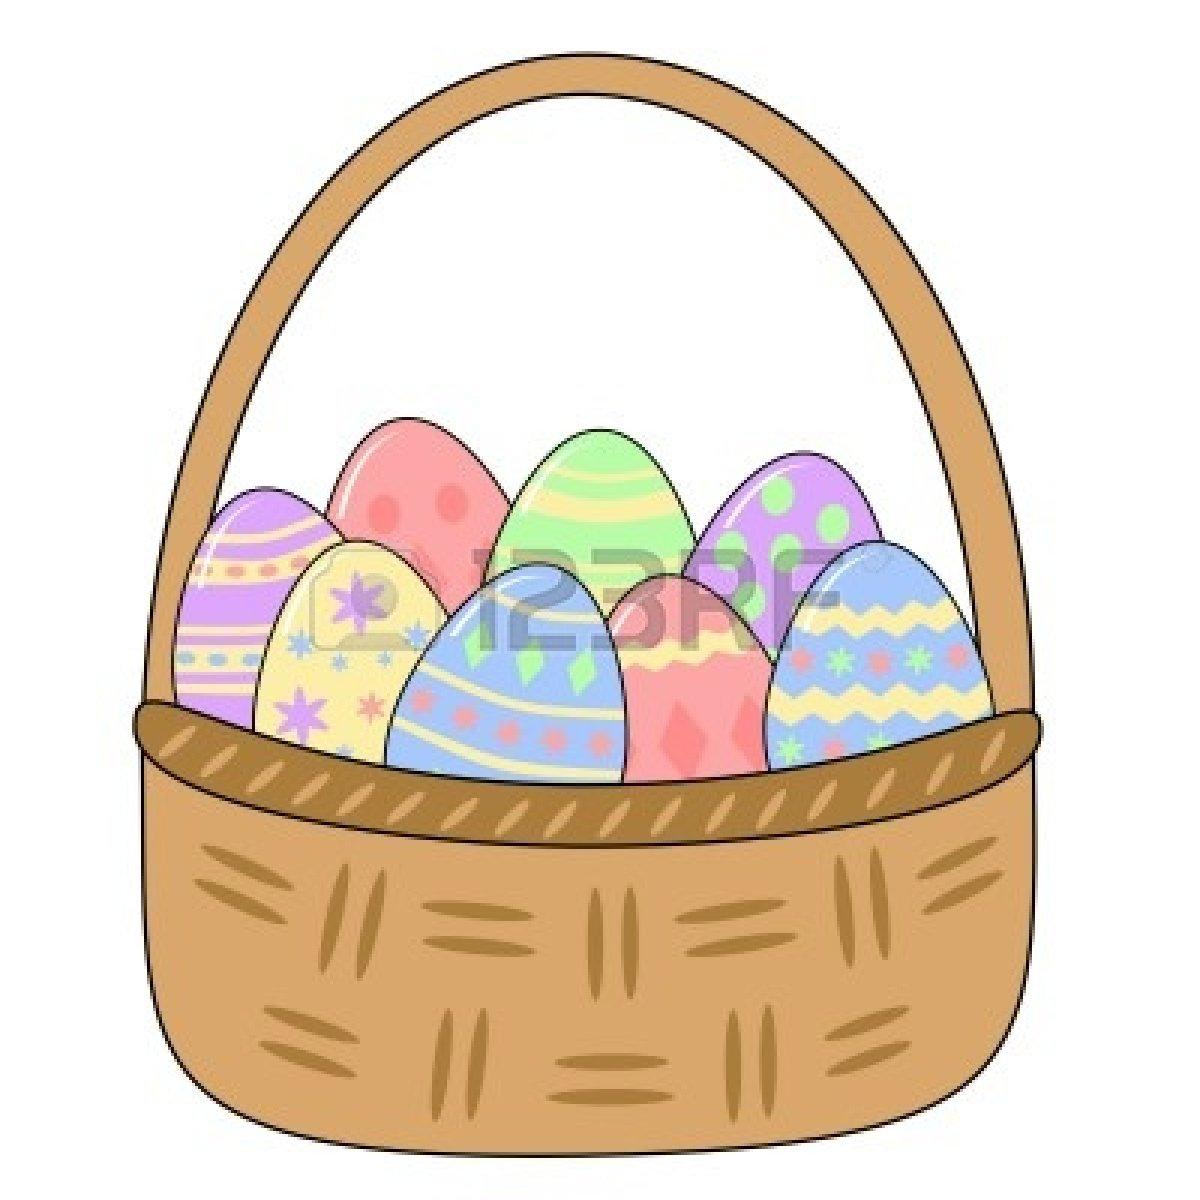 Basket clipart woven basket. Empty apple panda free